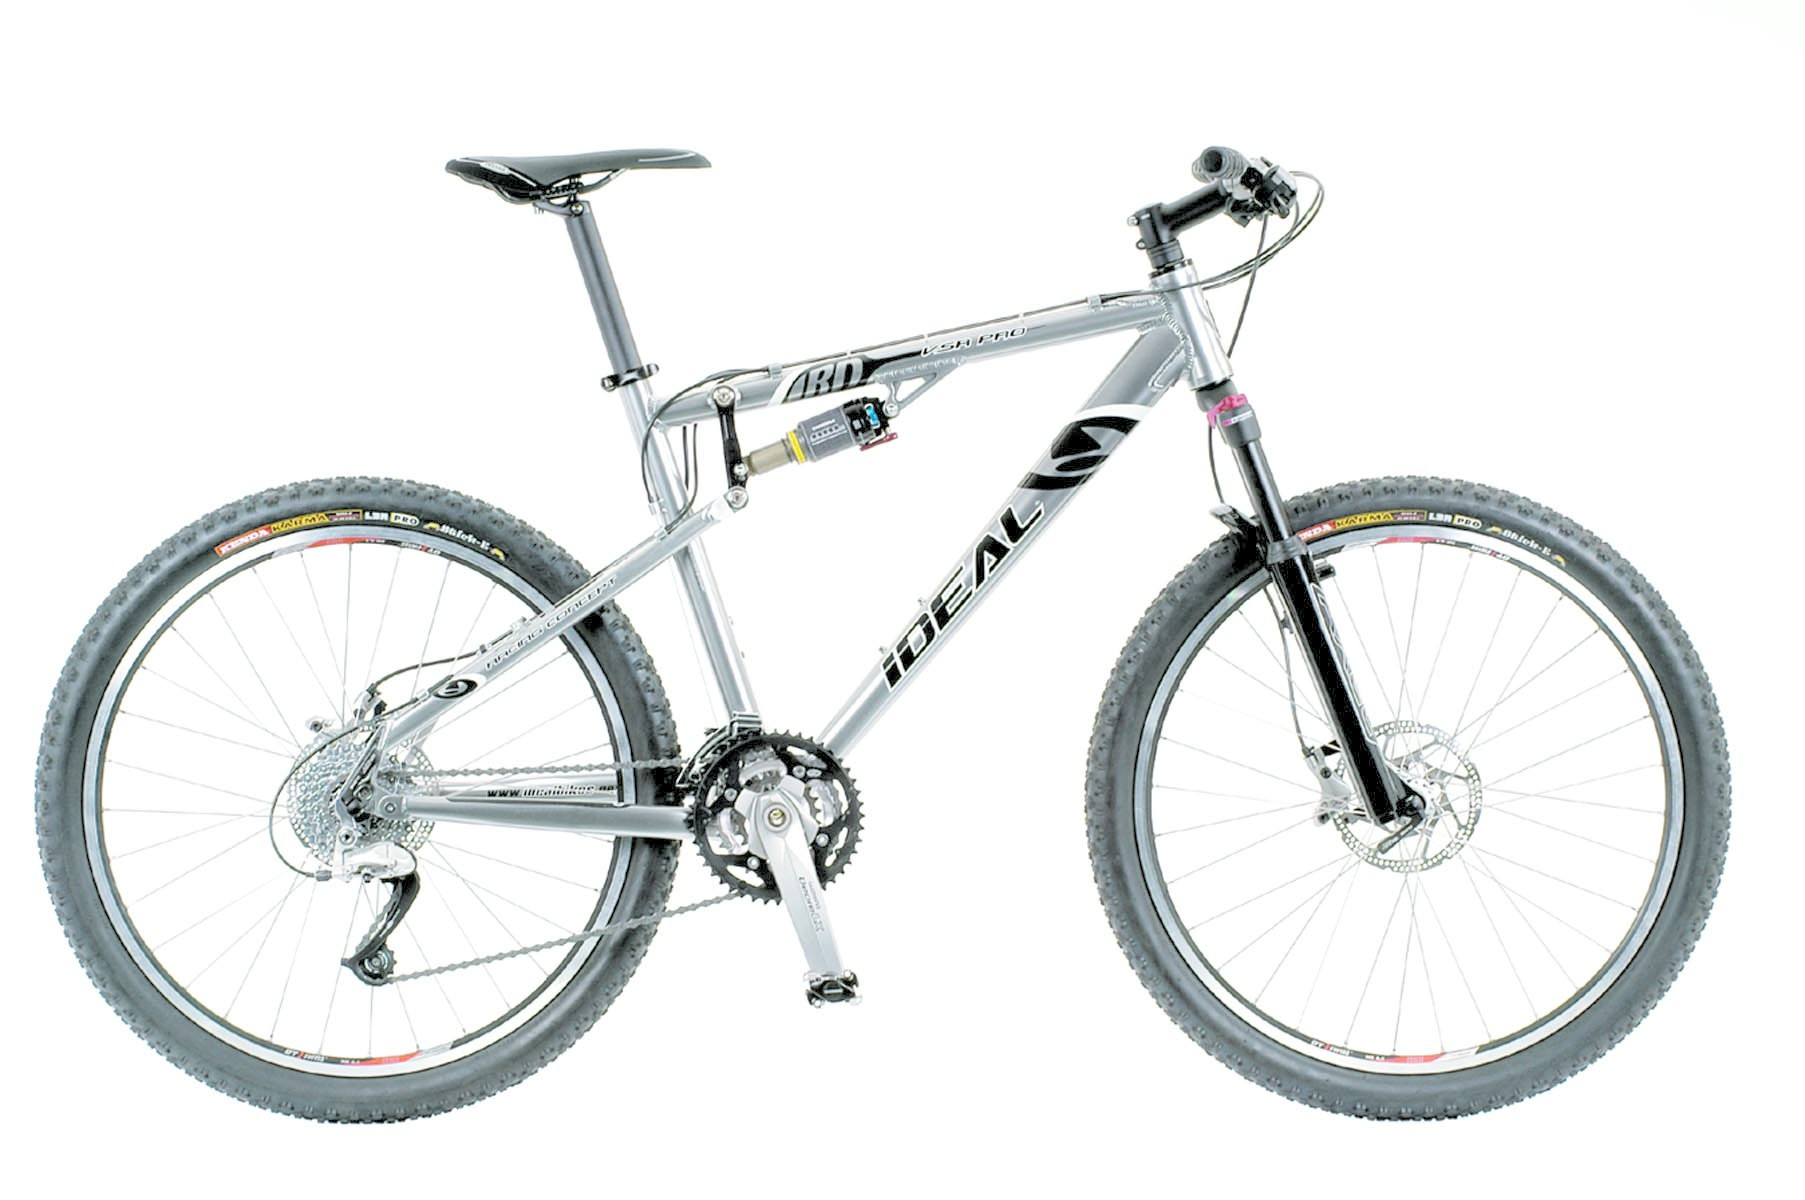 VSR PRO - FULL SUSPENSION - IDEAL Bikes